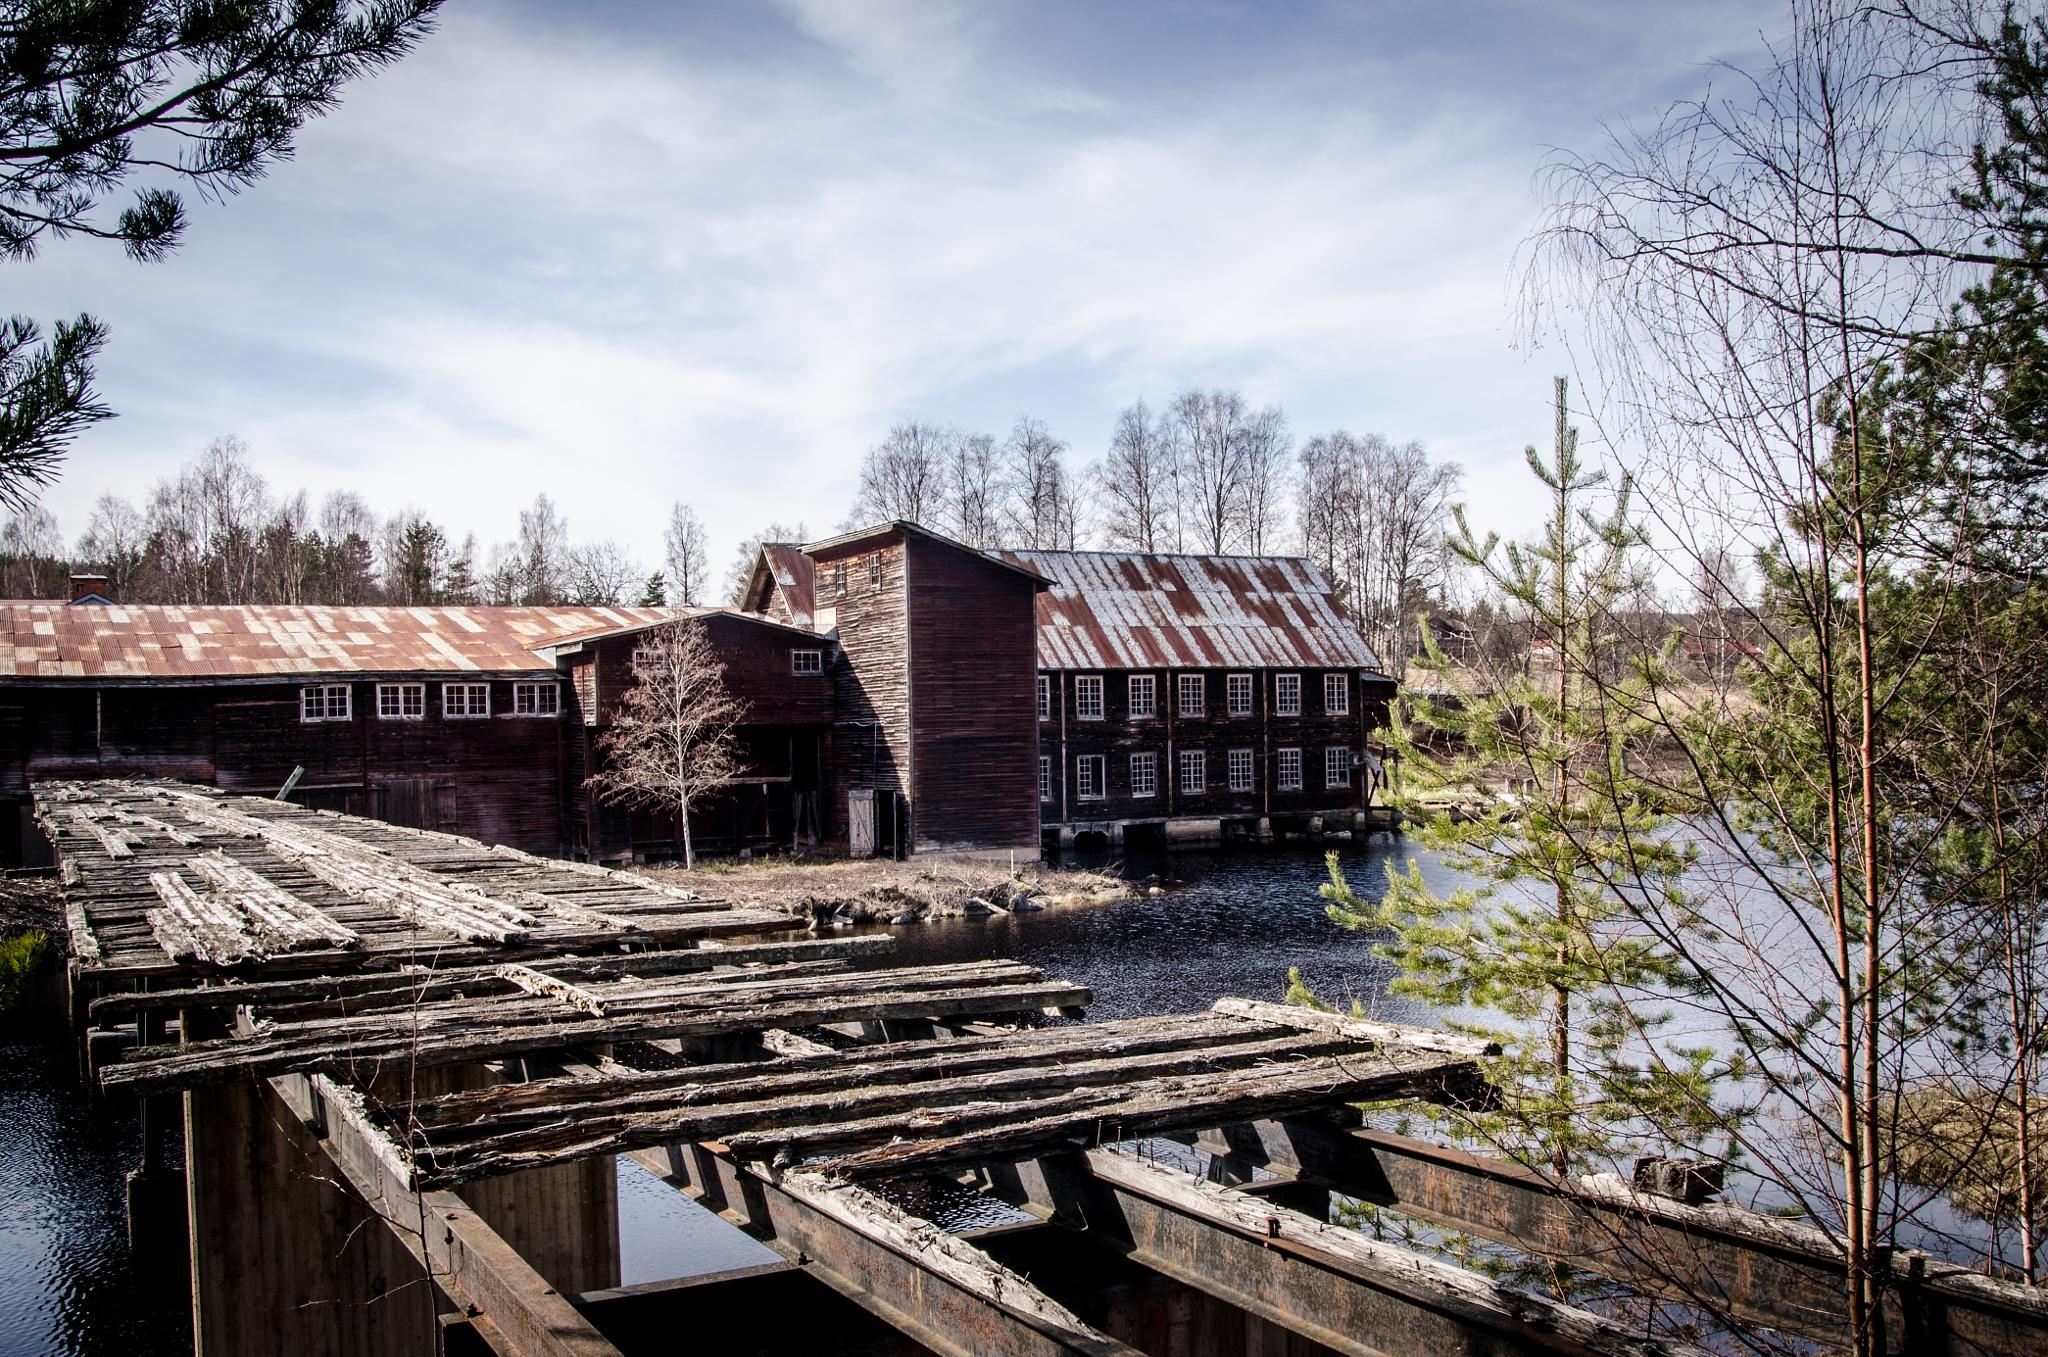 Sawmill by Mia Söderberg